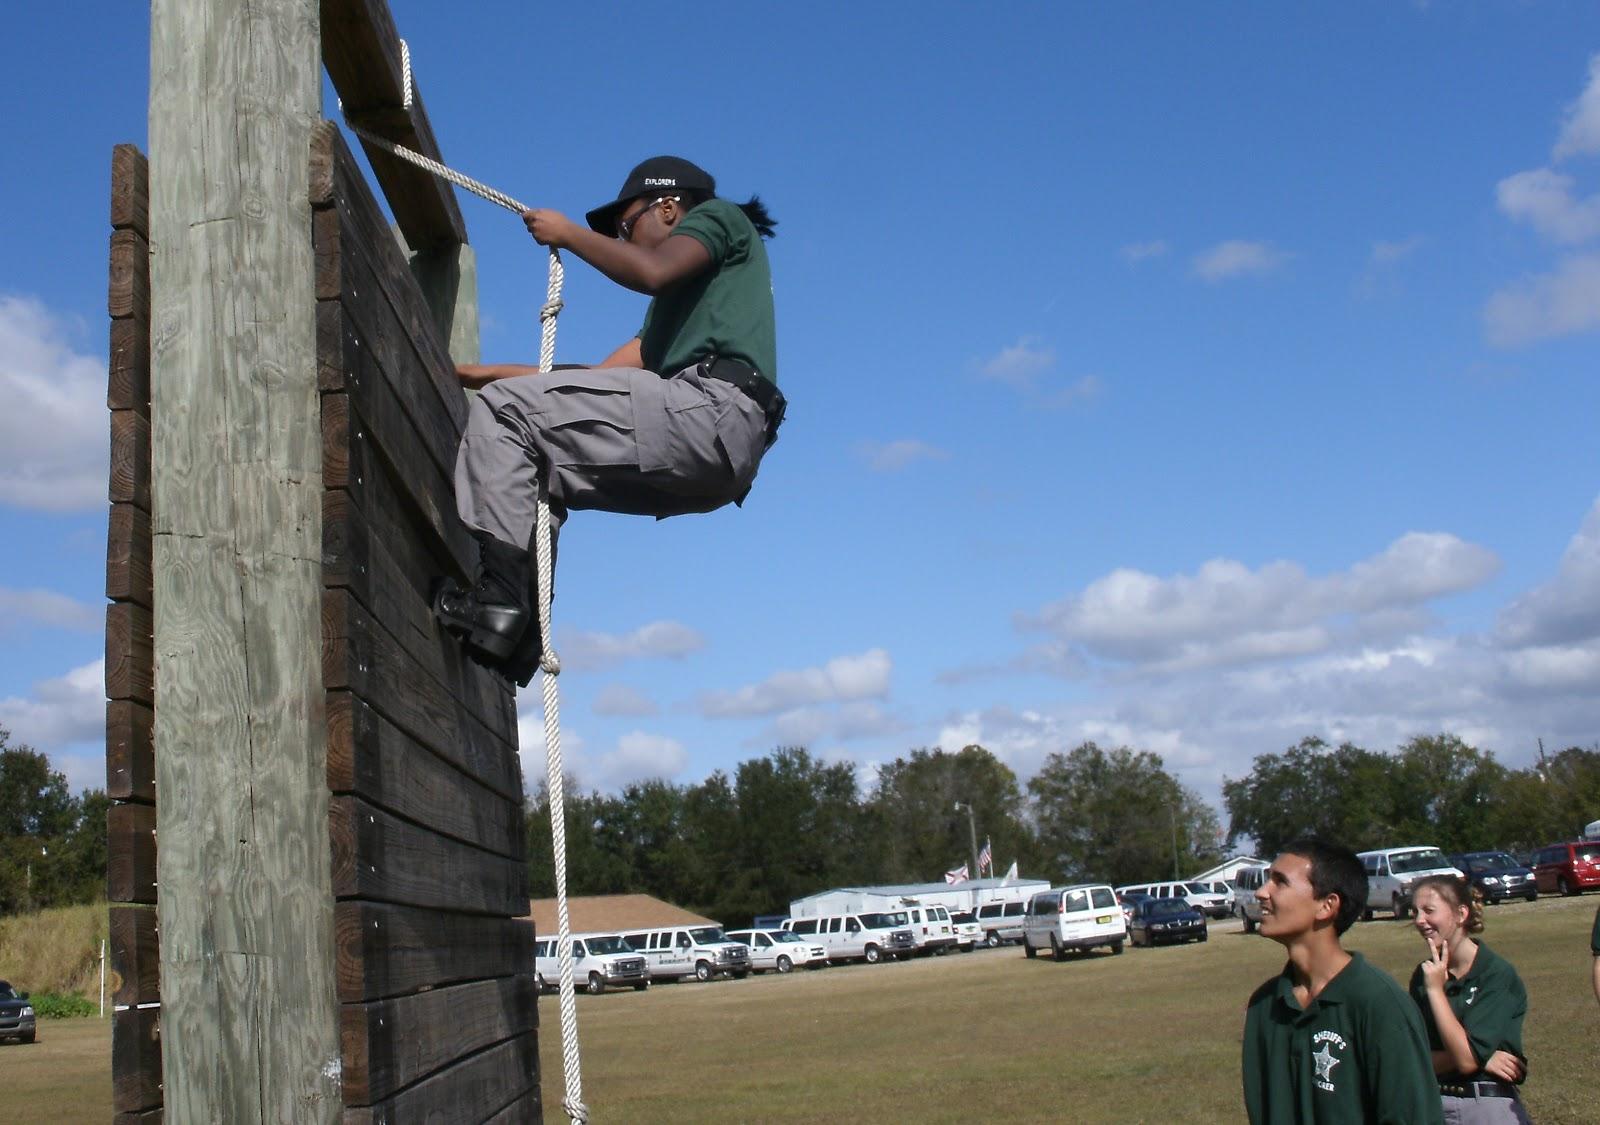 http://1.bp.blogspot.com/-3p5u1cWxS7k/UMJE-HYEhnI/AAAAAAAABZA/-ei9DRq9FHI/s1600/wall+climb.JPG